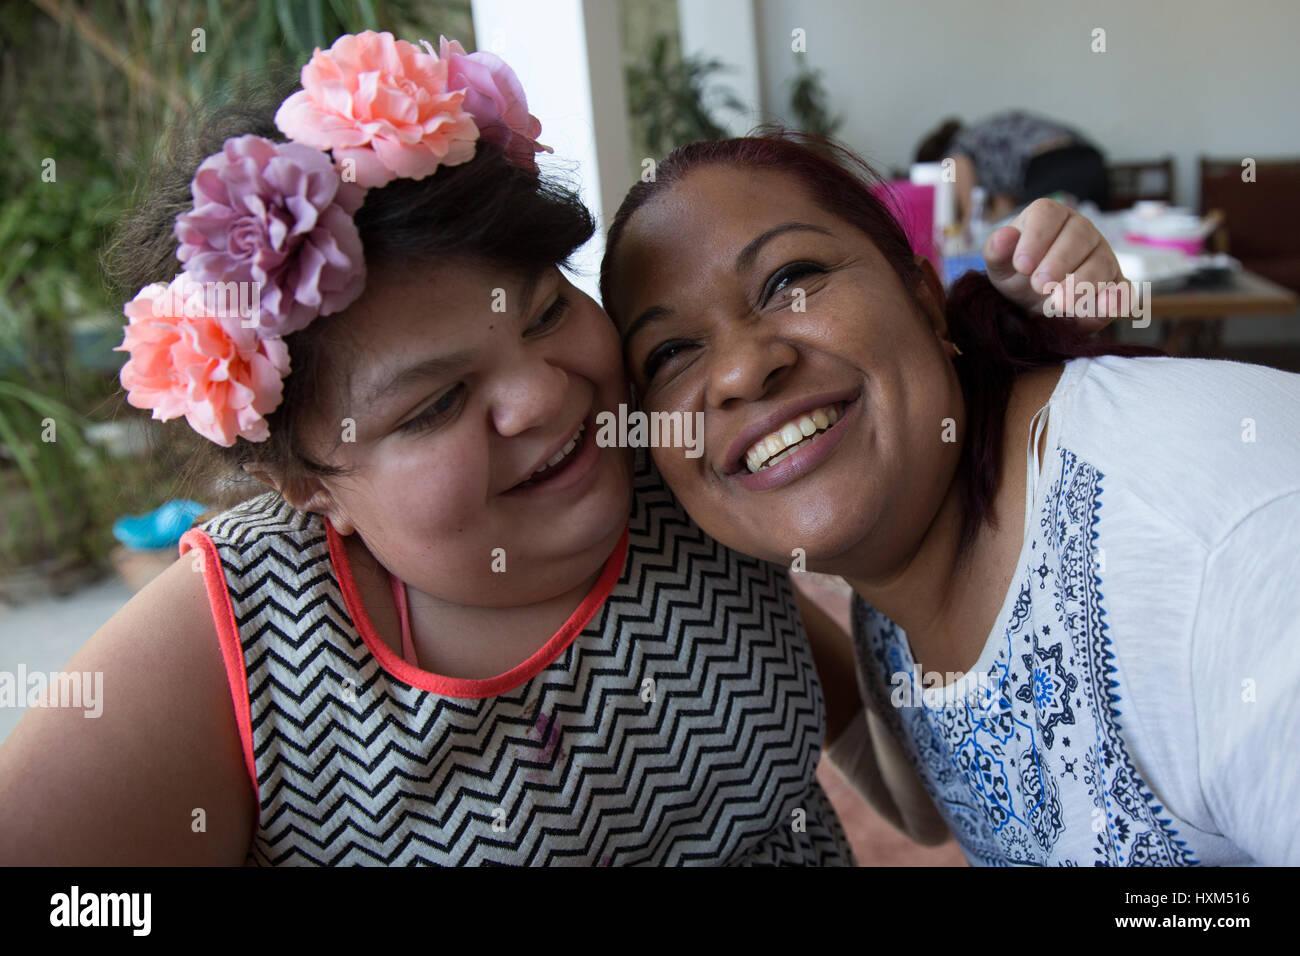 Ana Ximena Navarro (L) and her aunt Gabriela Rios Ballesteros (R), are pictured in Guadalajara, Mexico on February - Stock Image